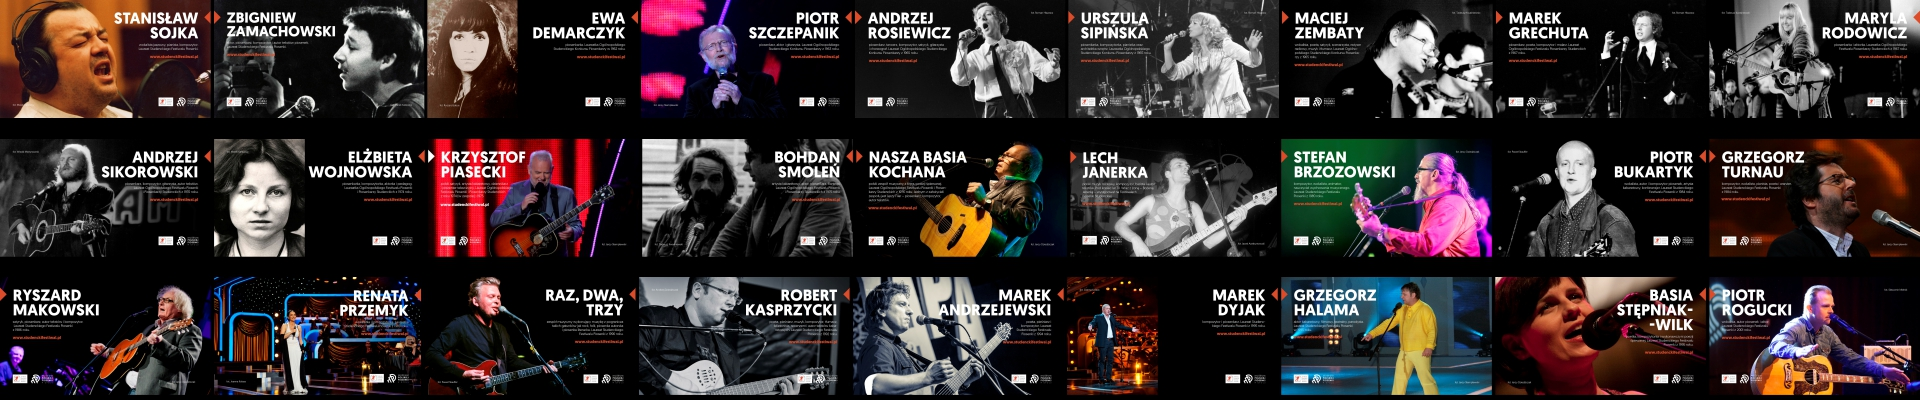 54. Studencki Festiwal Piosenki - Krakowski Festiwal Piosenki